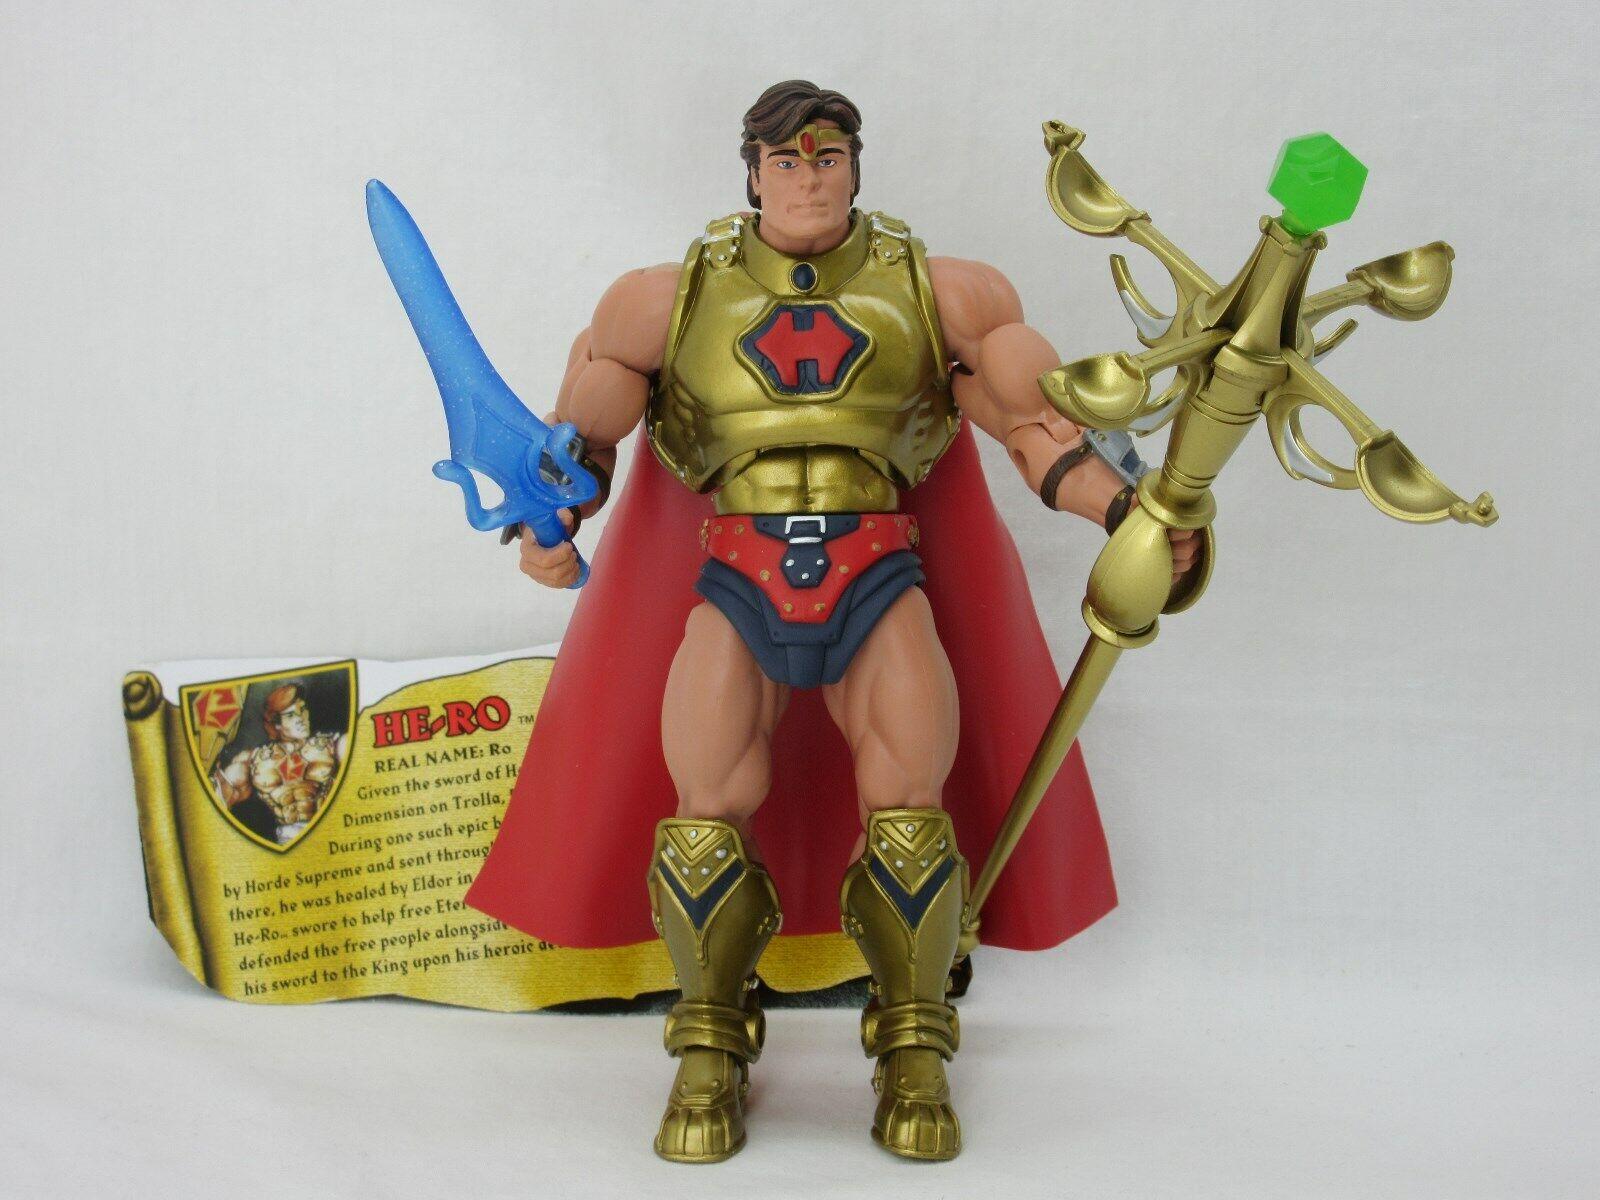 MOTUC,MOTU,HE-RO,Masters Of Of Of The Universe Classics,100% Complete,He man a2fddc